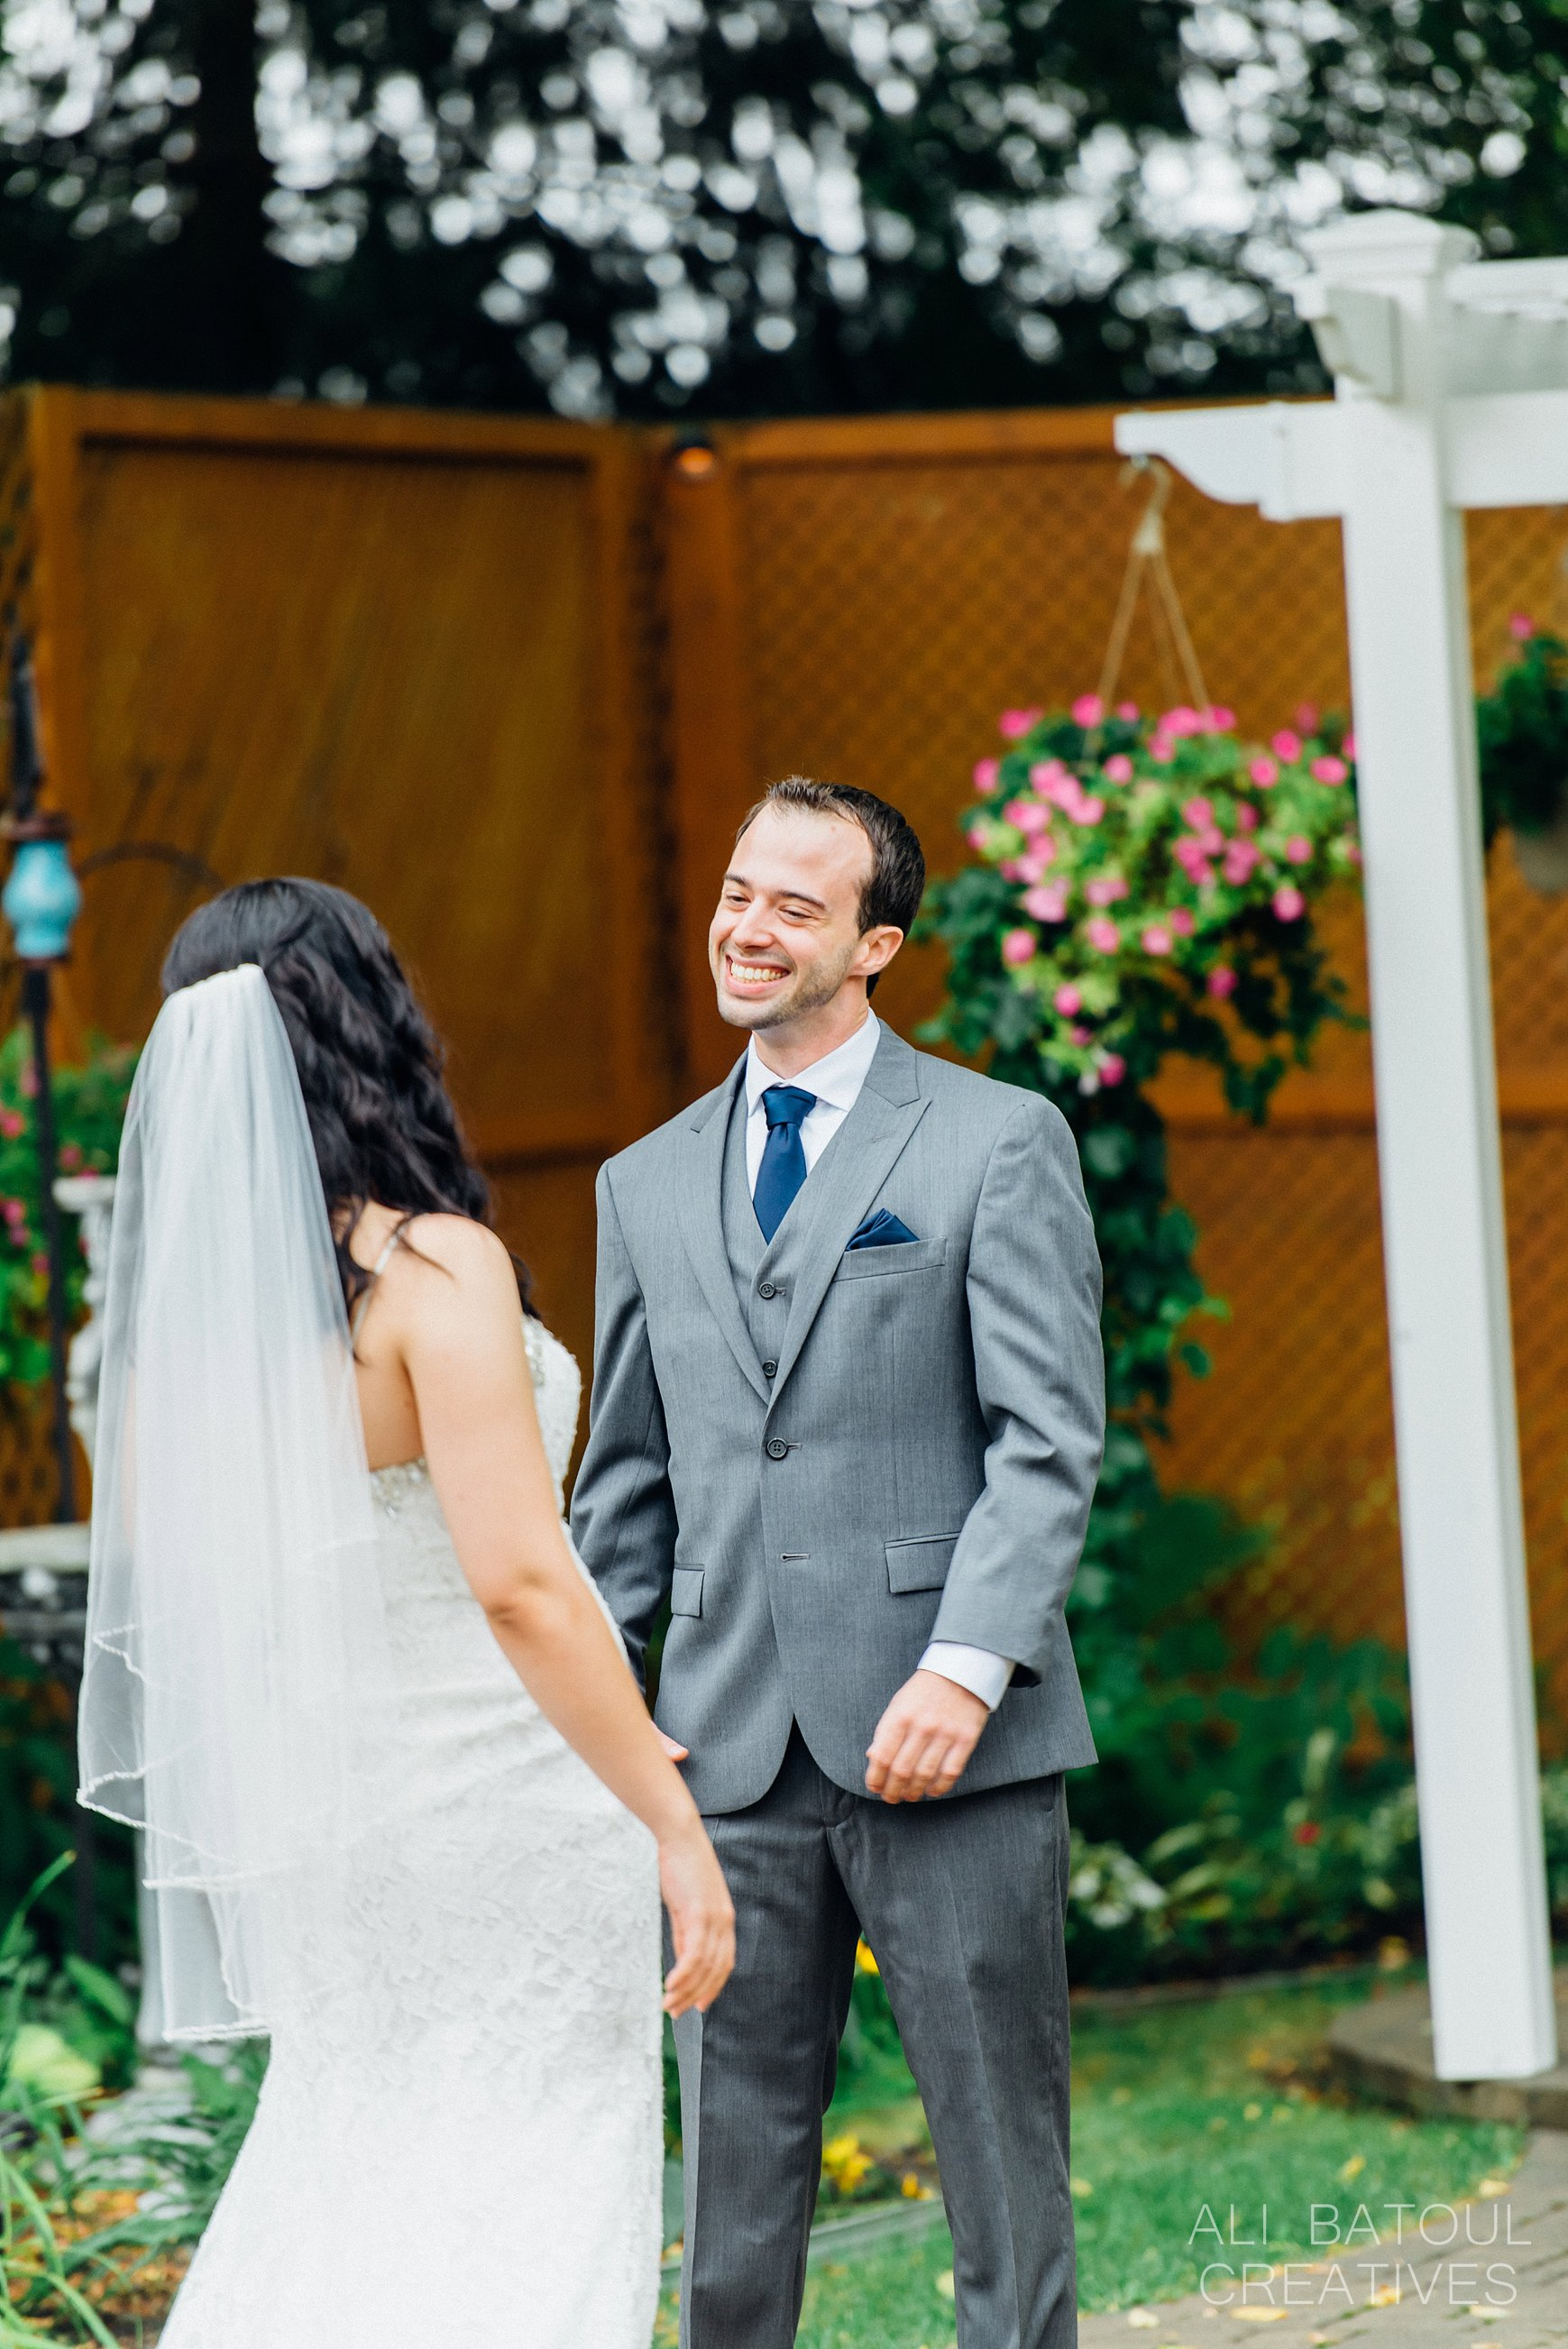 Jocelyn + Steve At The Schoolhouse Wedding - Ali and Batoul Fine Art Wedding Photography_0026.jpg